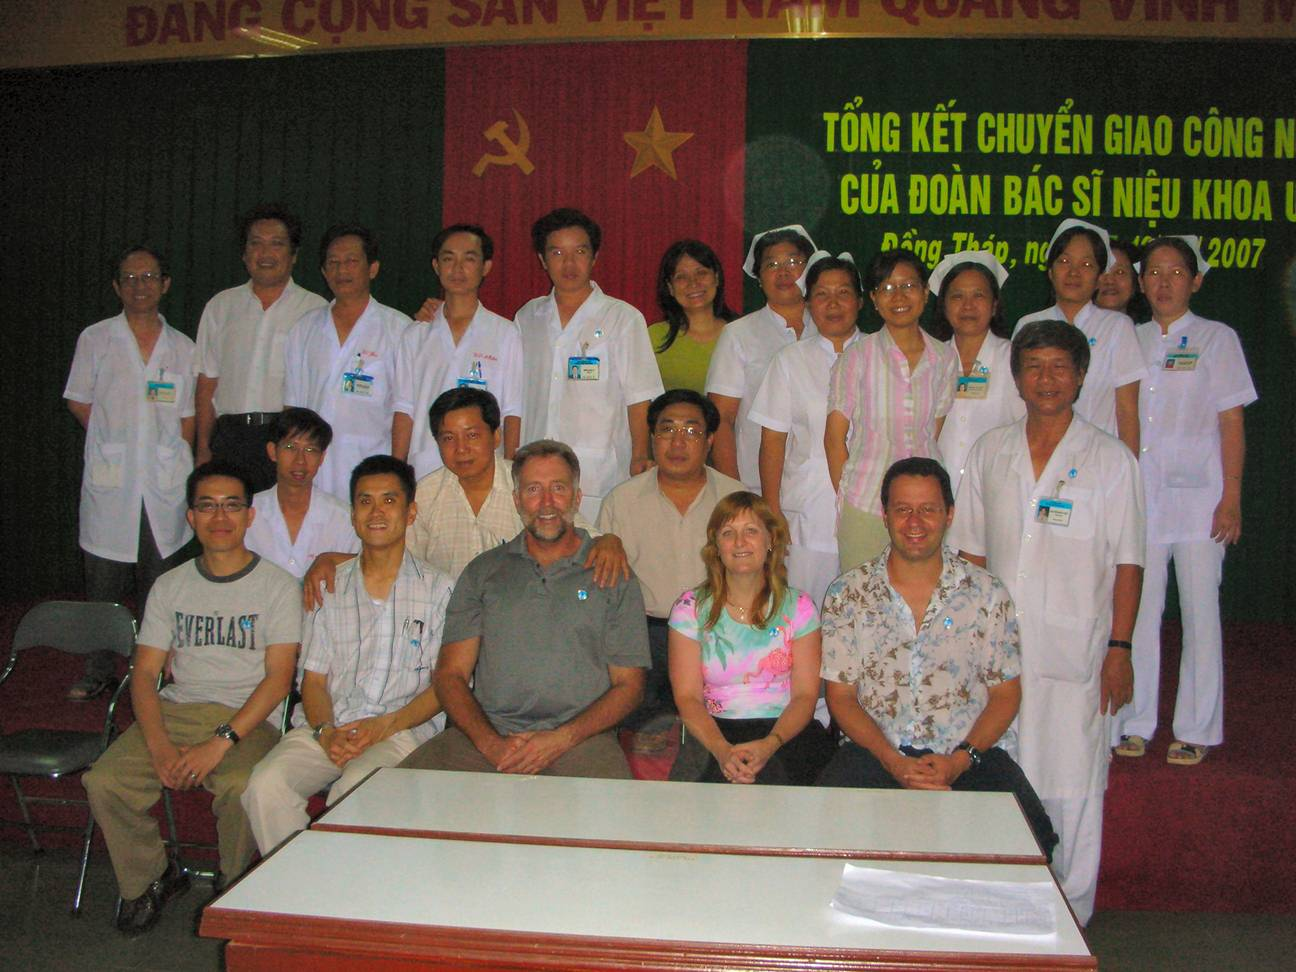 Dr Mark Louie-Johnsun - Australian Urologist Team